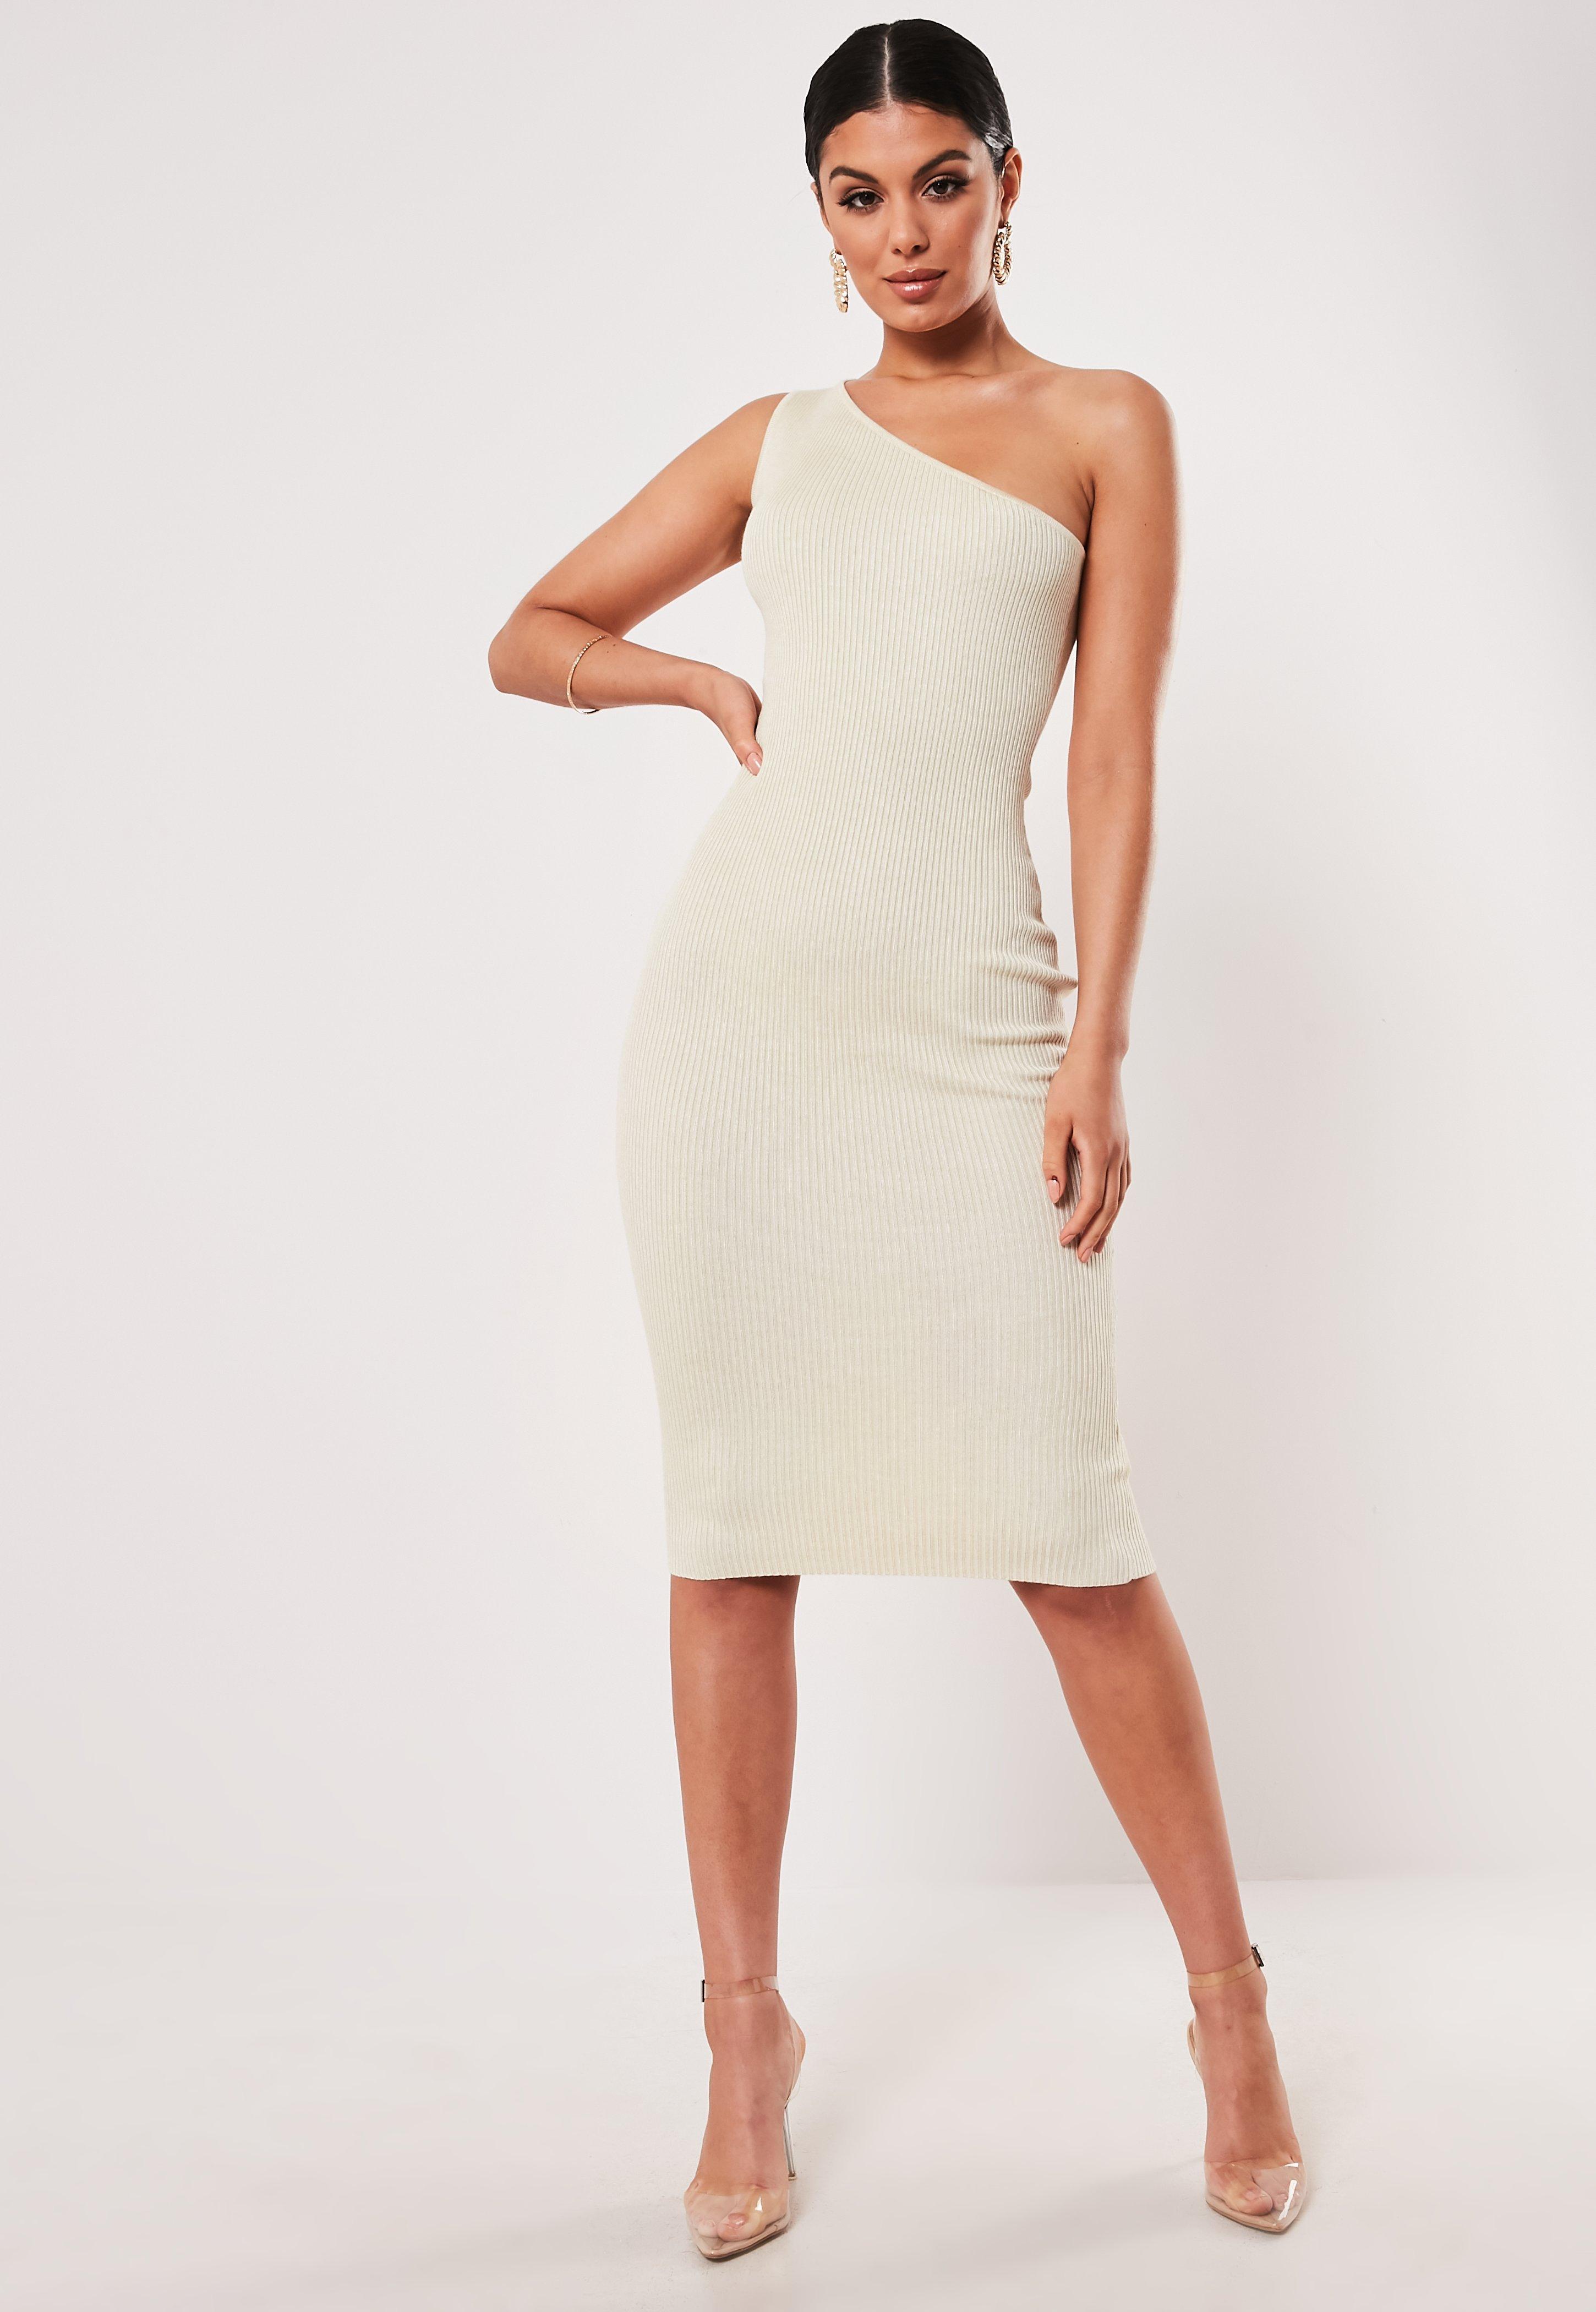 d385371d6081 Nude Dresses | Beige & Camel Dresses - Missguided